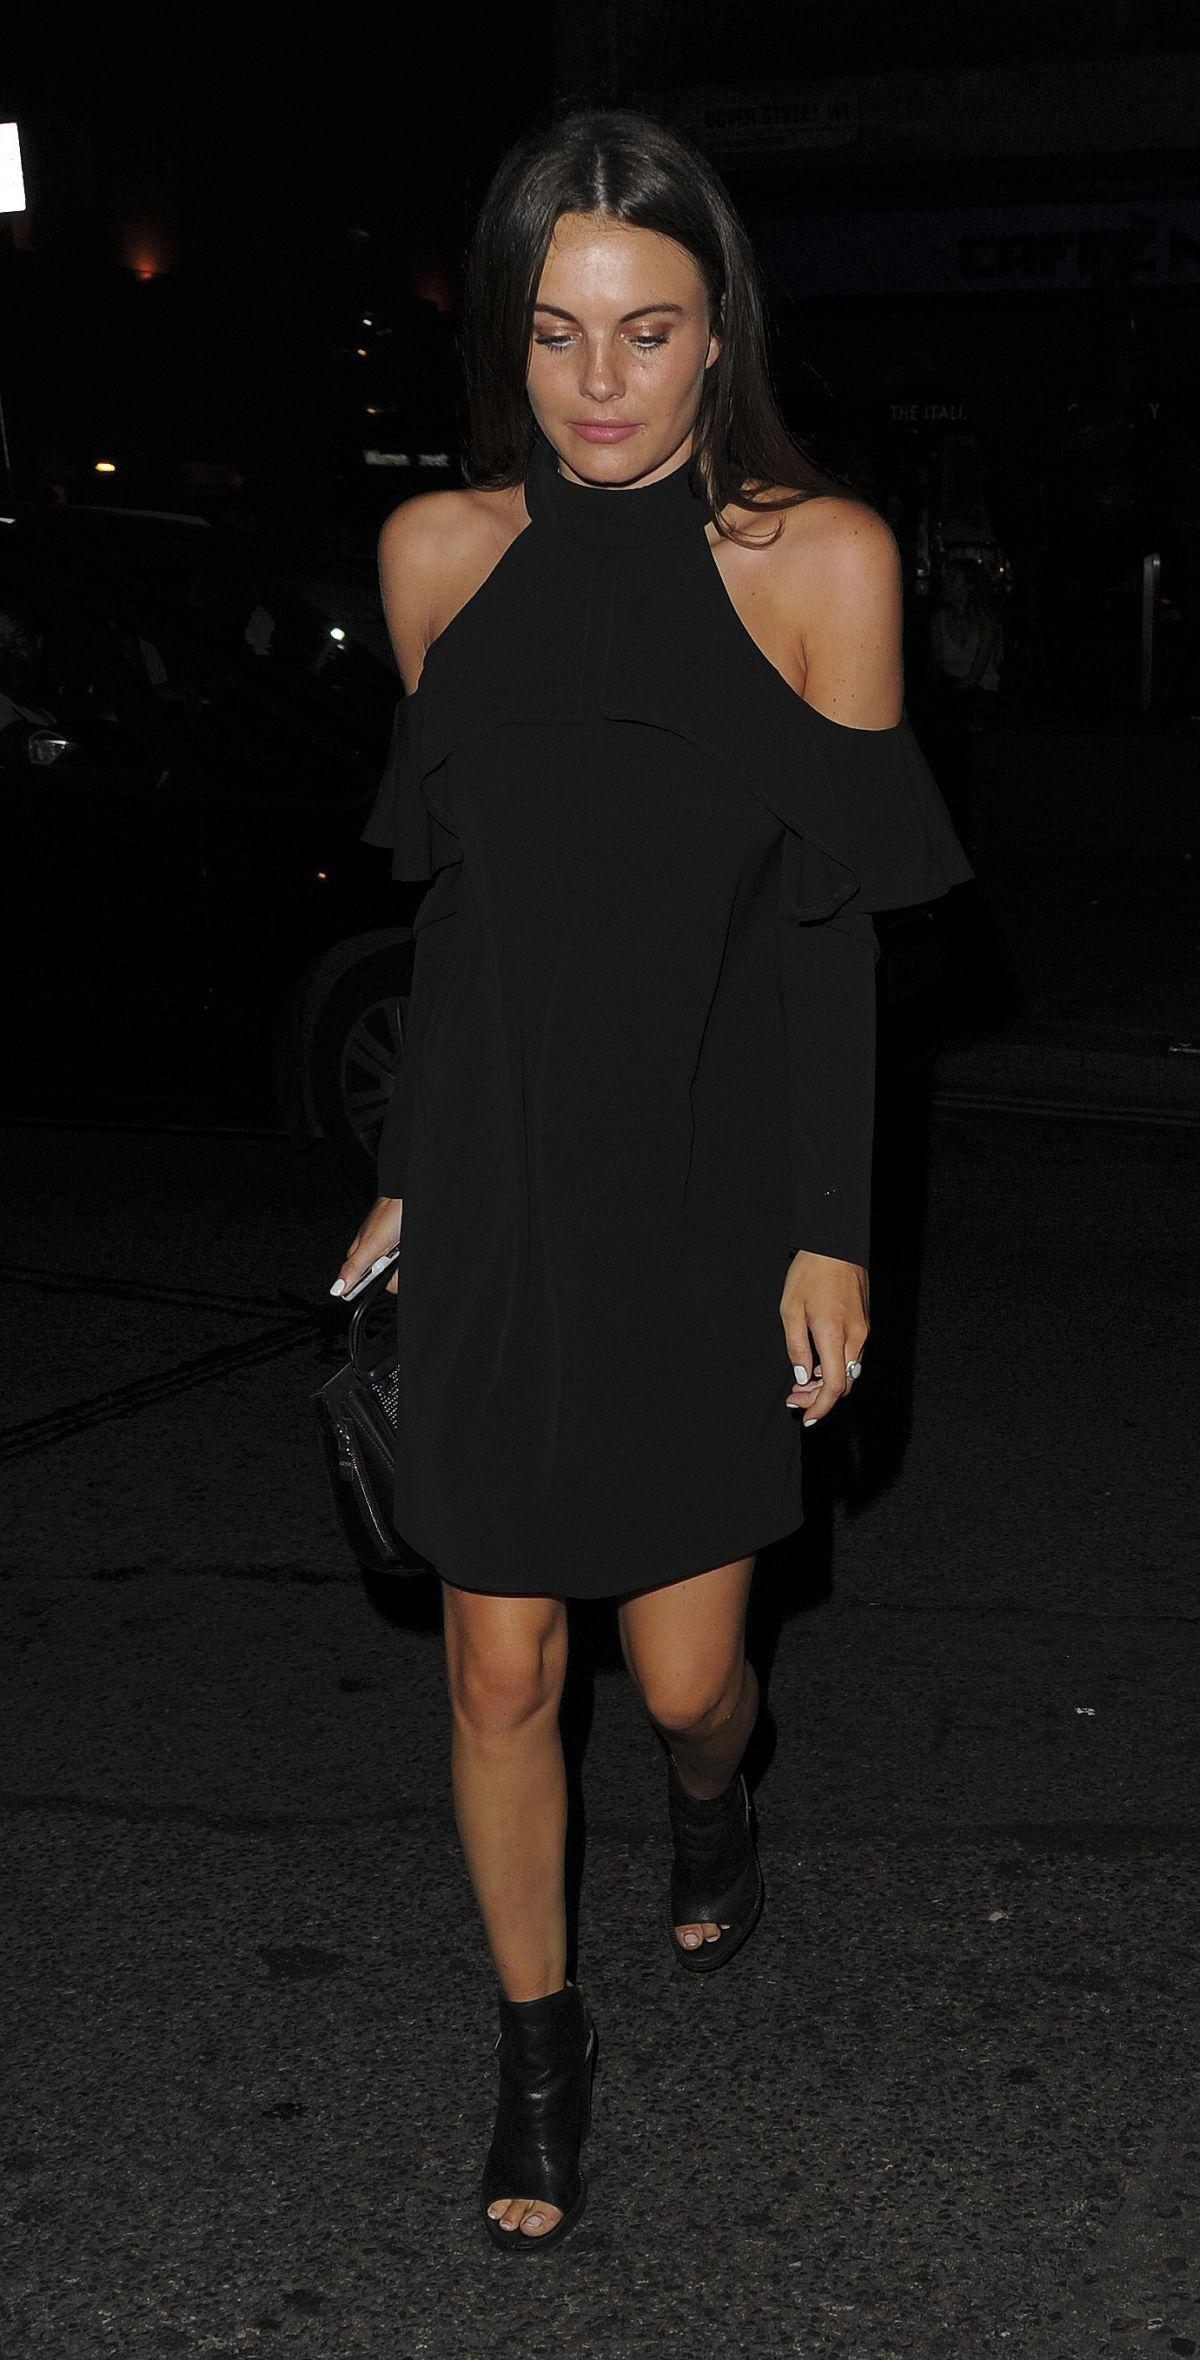 EMILY BLACKWELL Arrives at Mahiki Nightclub in London 07/08/2017